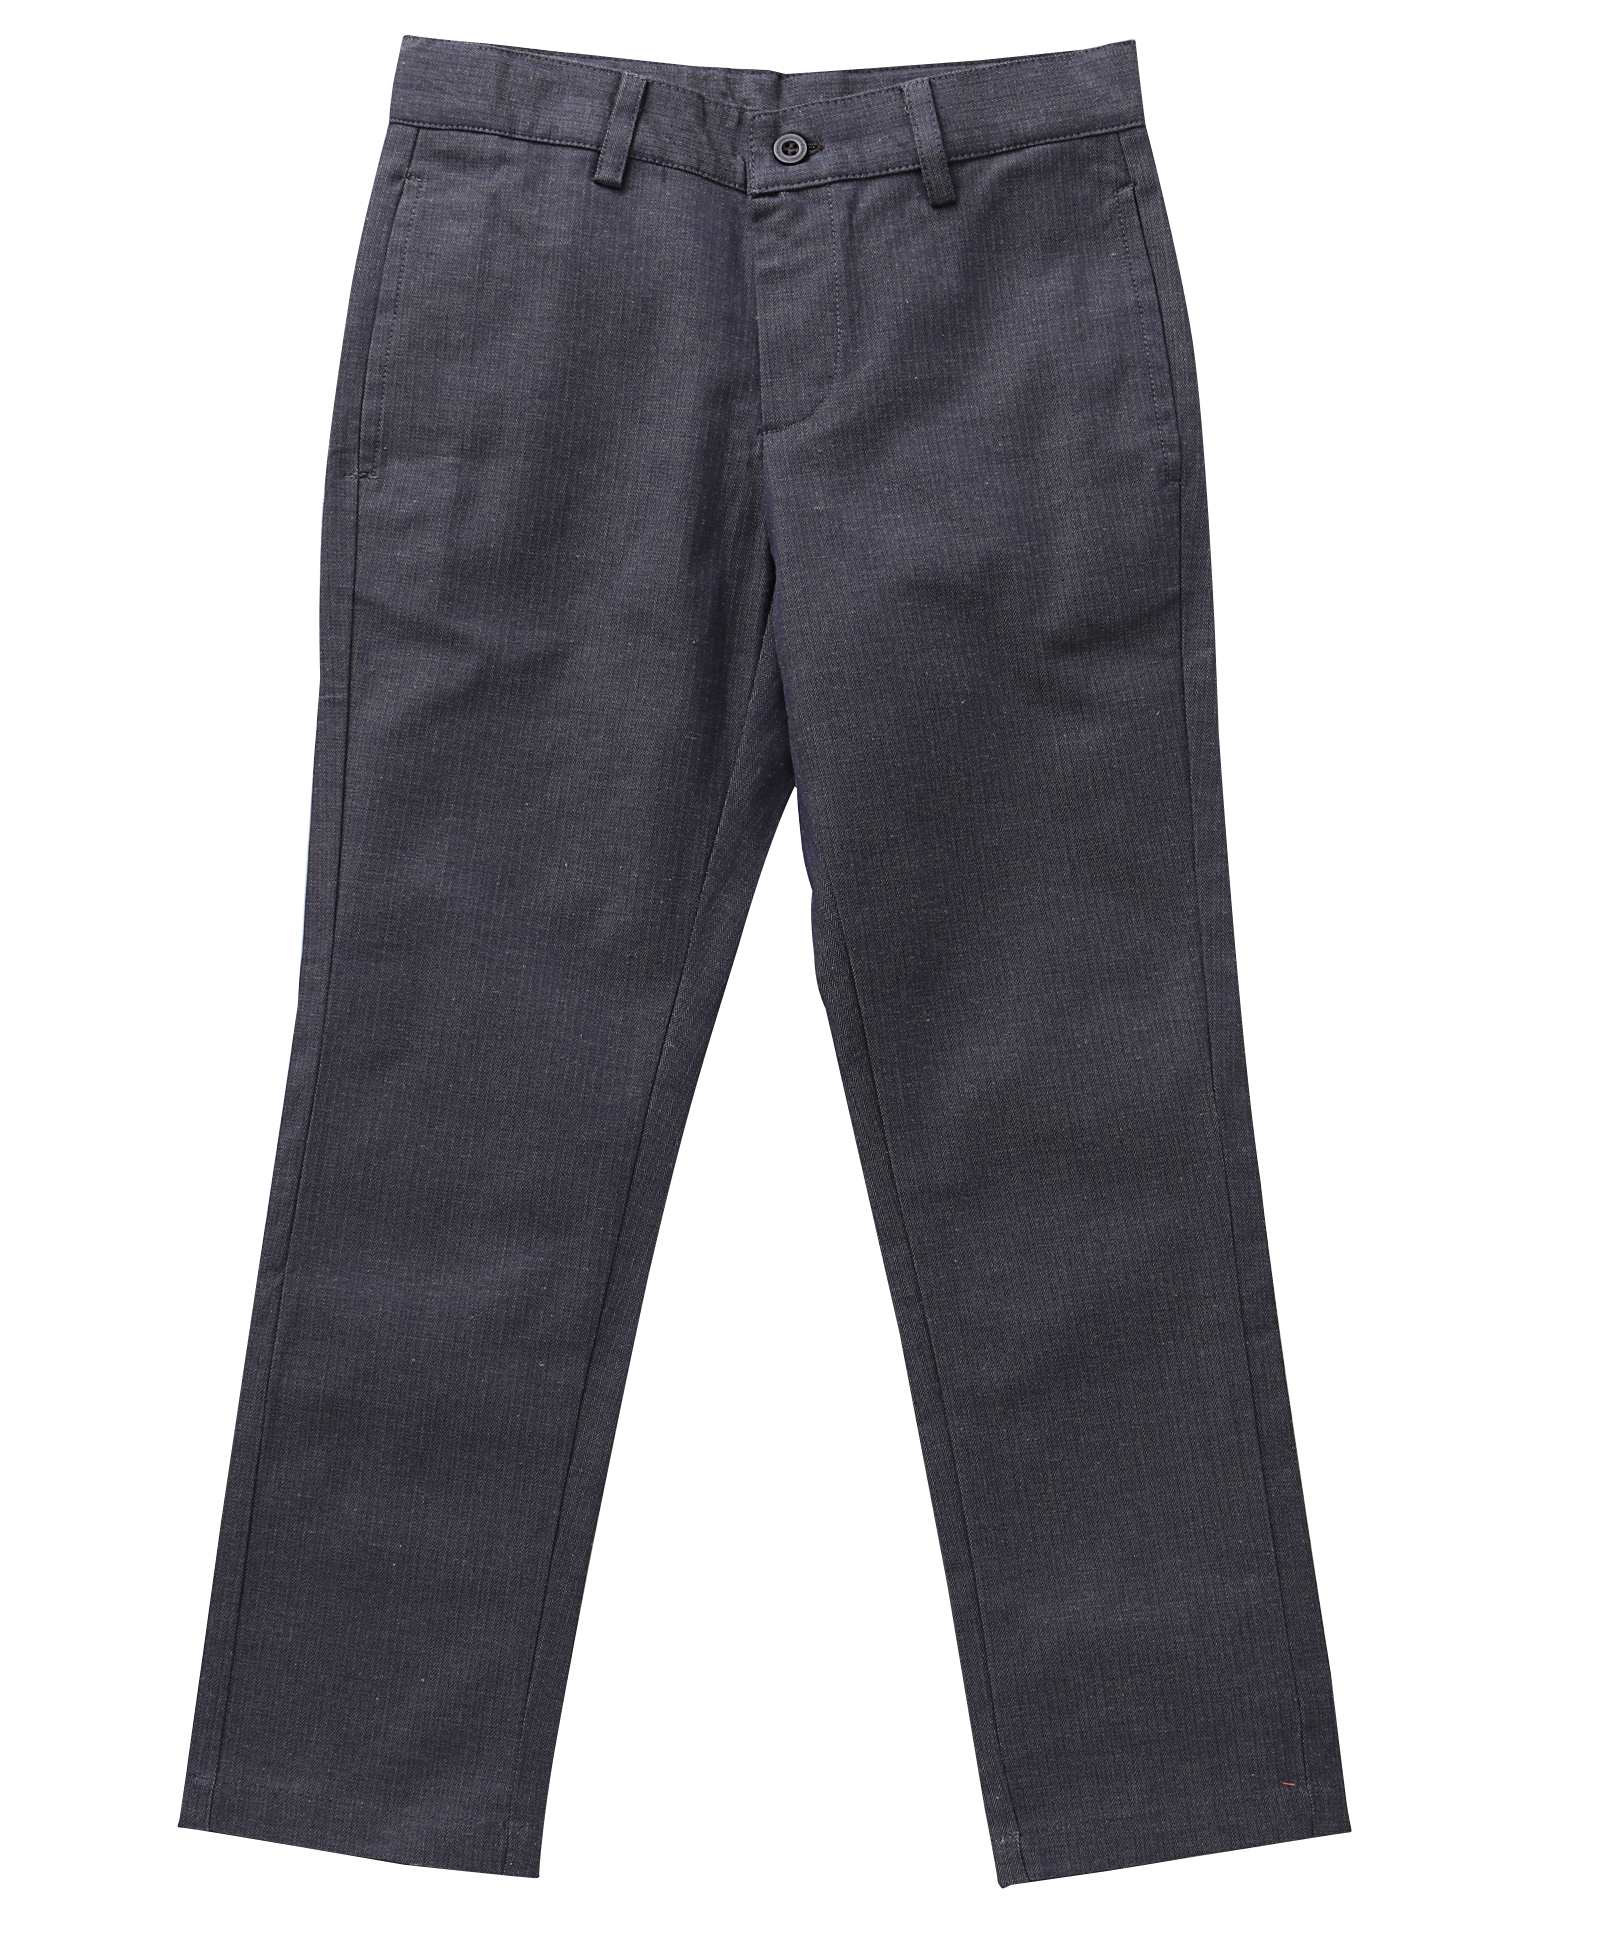 Popsicles Clothing | Popsicles Spruce Dapper Pants Regular Fit For Boys